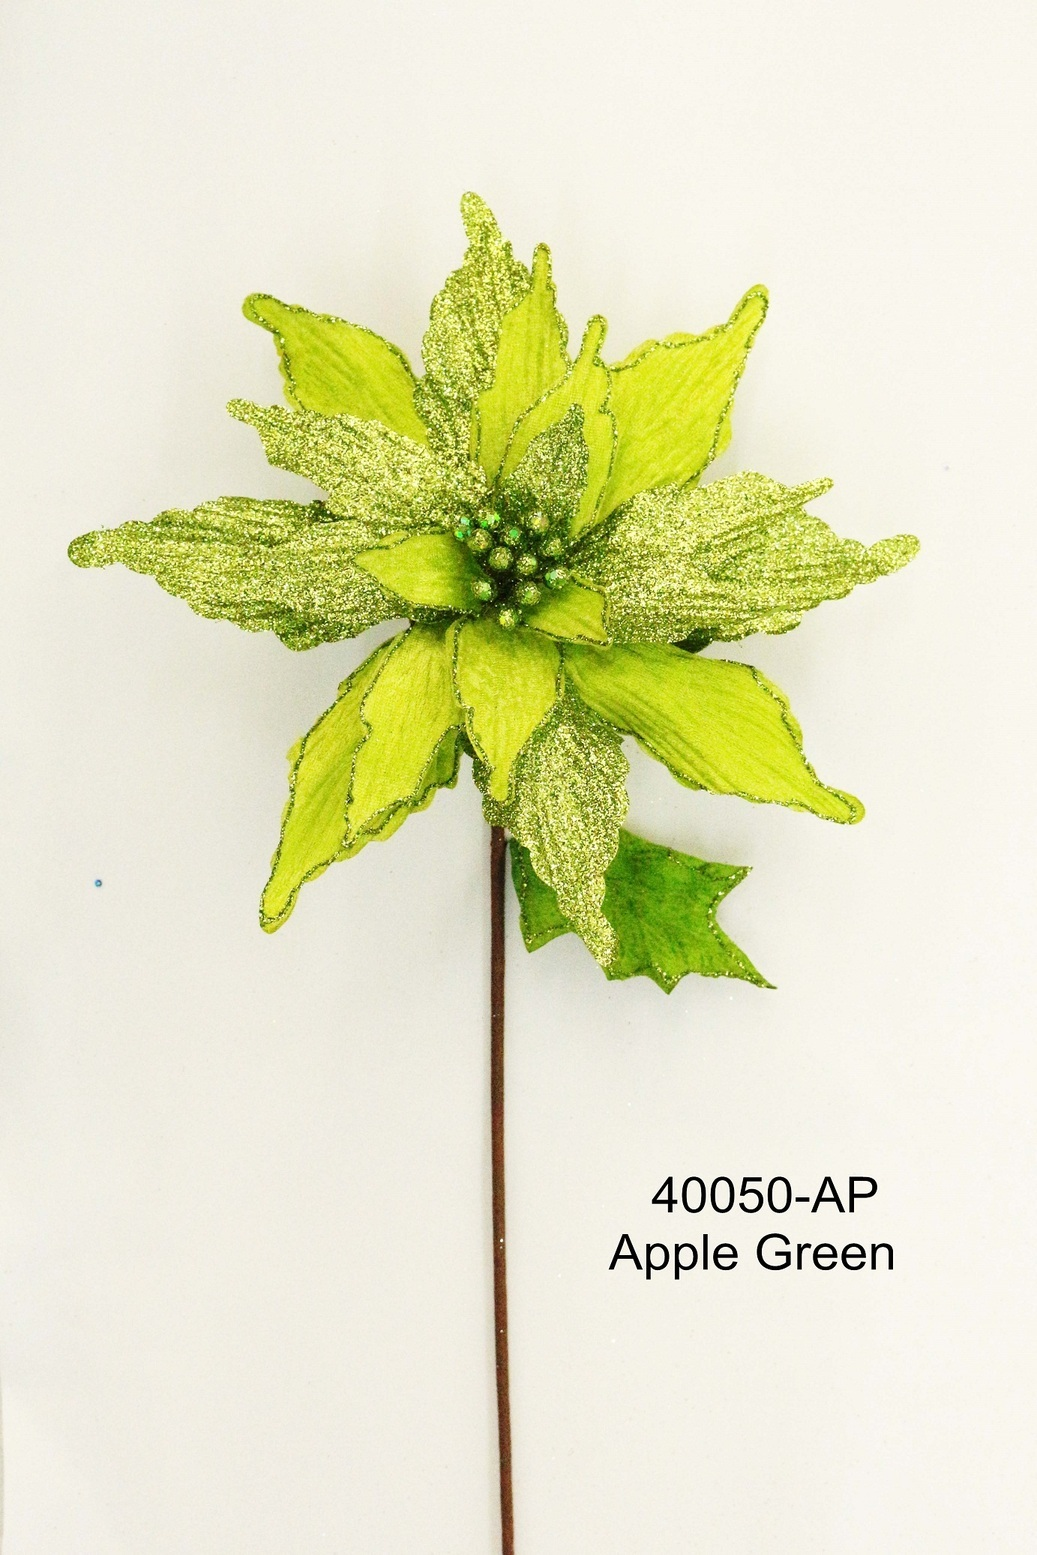 40050-AP